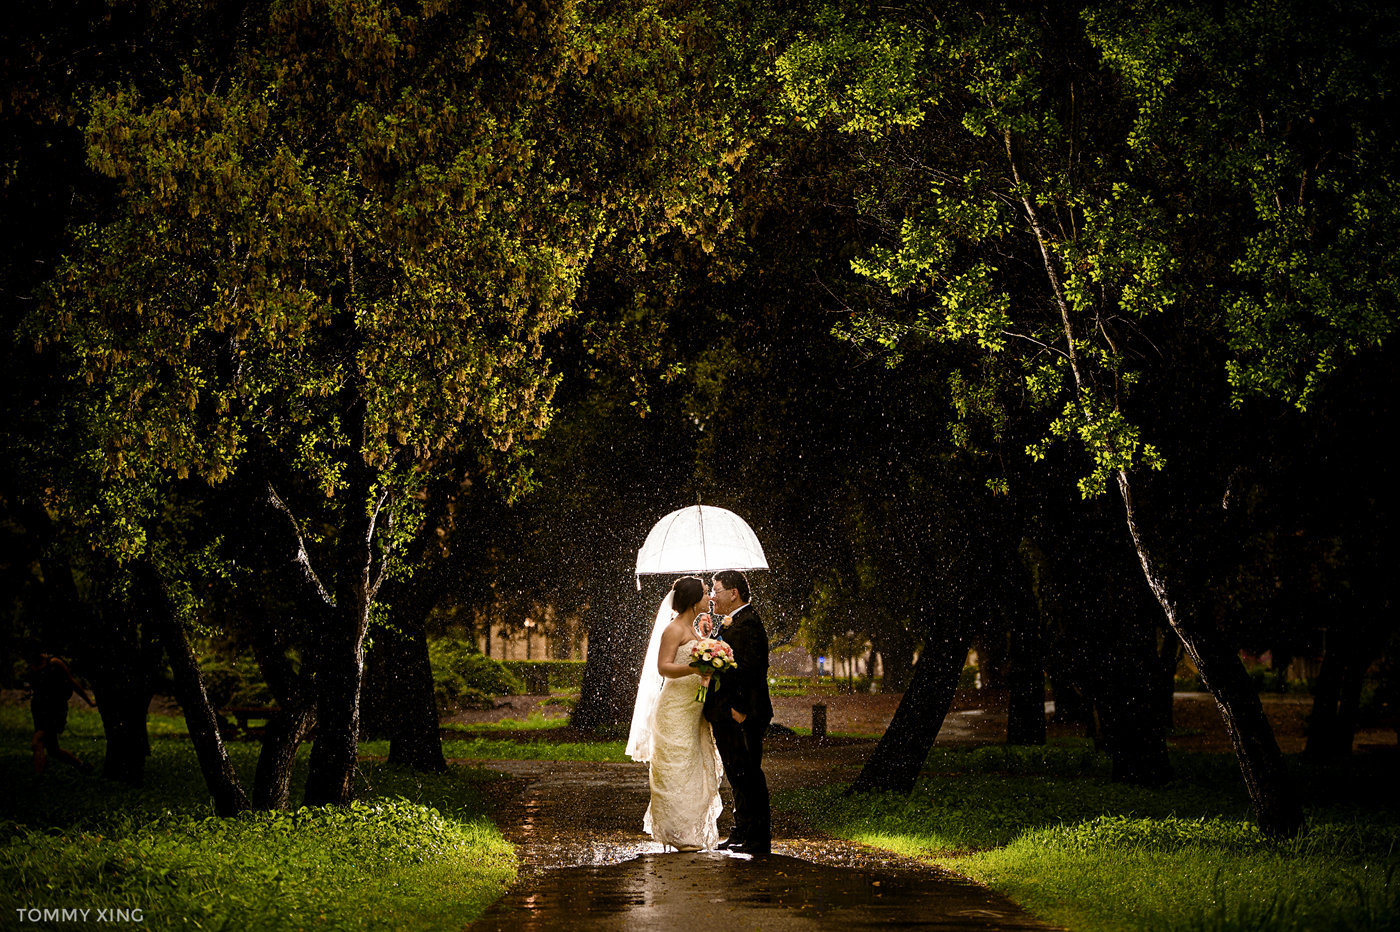 STANFORD MEMORIAL CHURCH WEDDING - Wenjie & Chengcheng - SAN FRANCISCO BAY AREA 斯坦福教堂婚礼跟拍 - 洛杉矶婚礼婚纱照摄影师 Tommy Xing Photography165.jpg